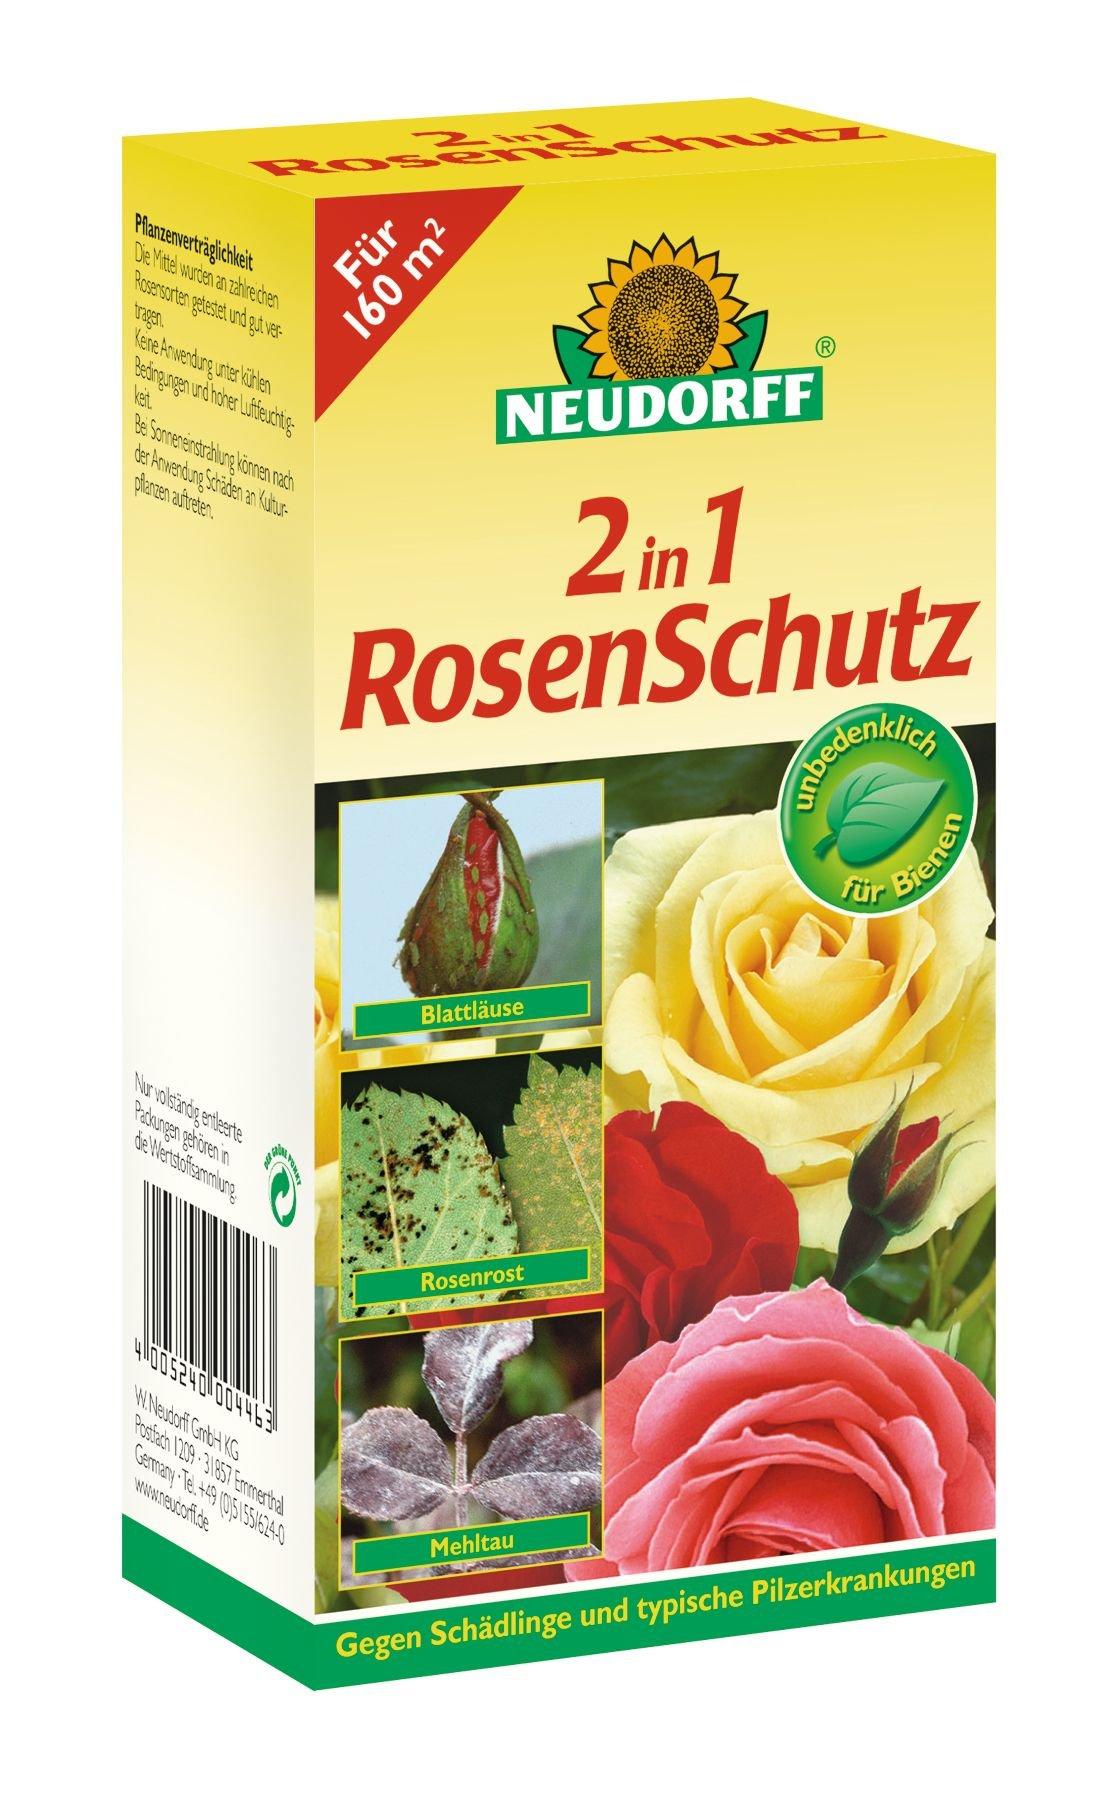 Neudorff  2-in-1 RosenSchutz product image